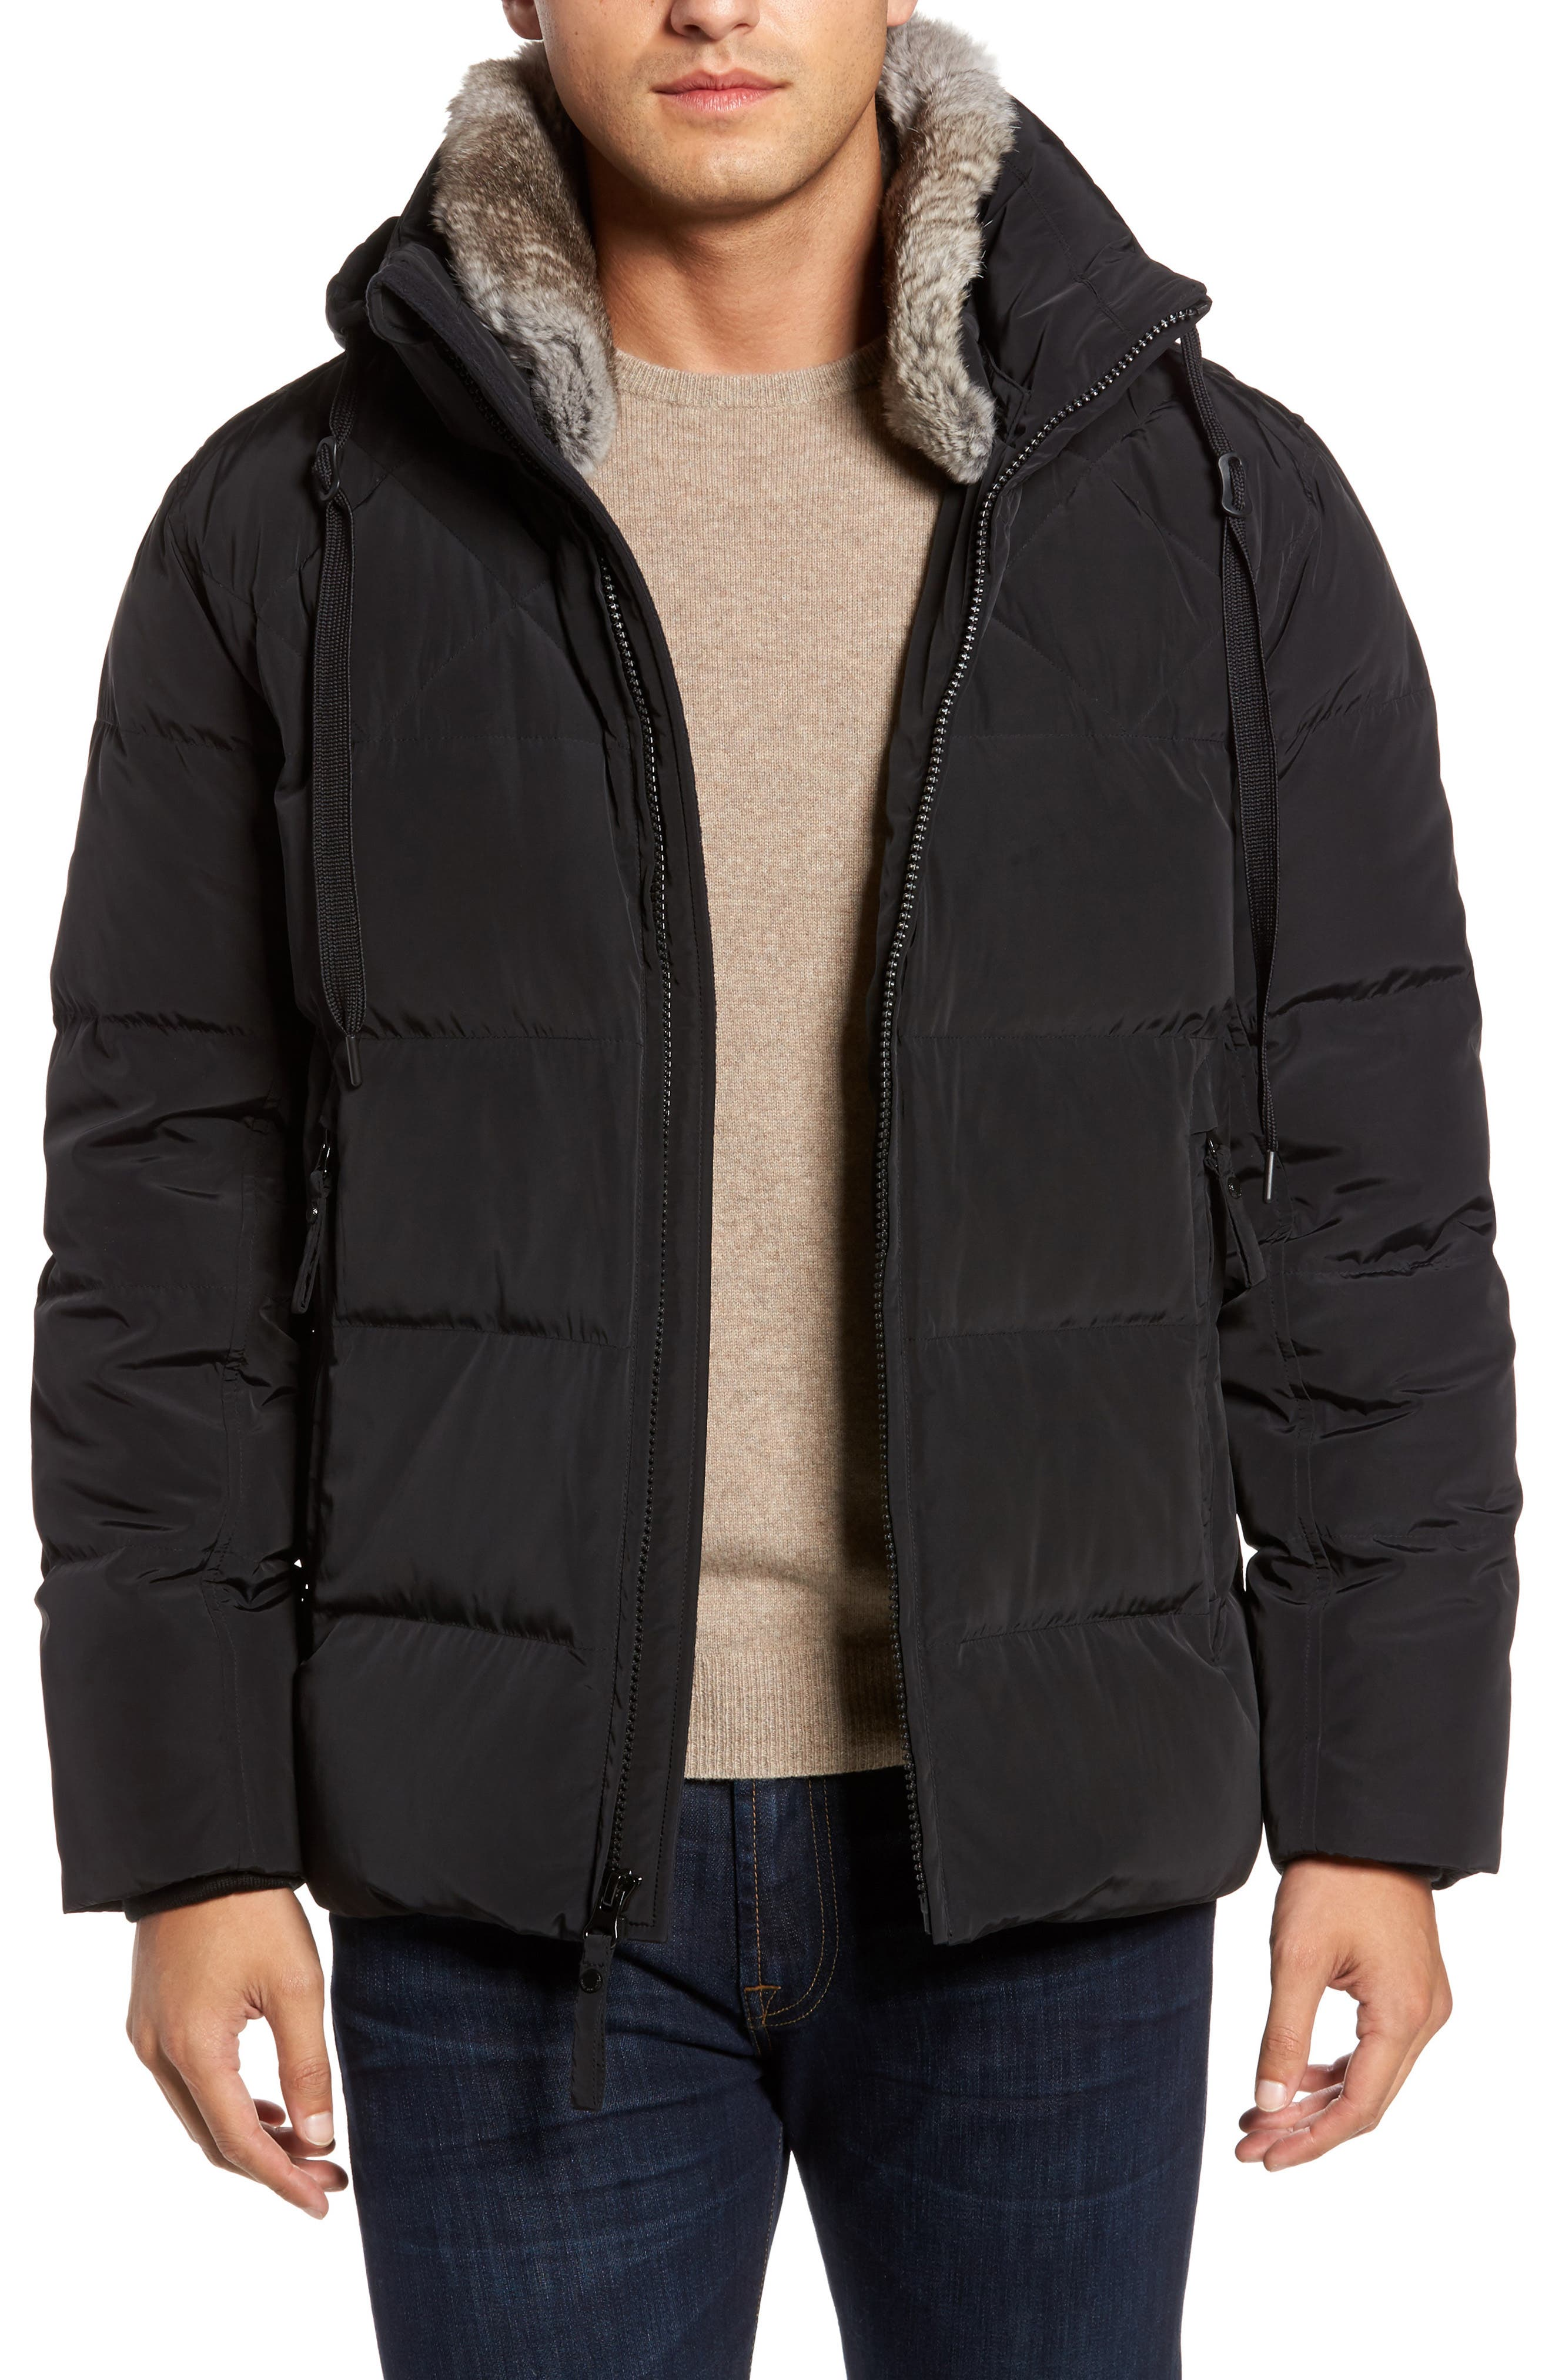 Marc New York Navan Quilted Down Jacket with Genuine Rabbit Fur Trim